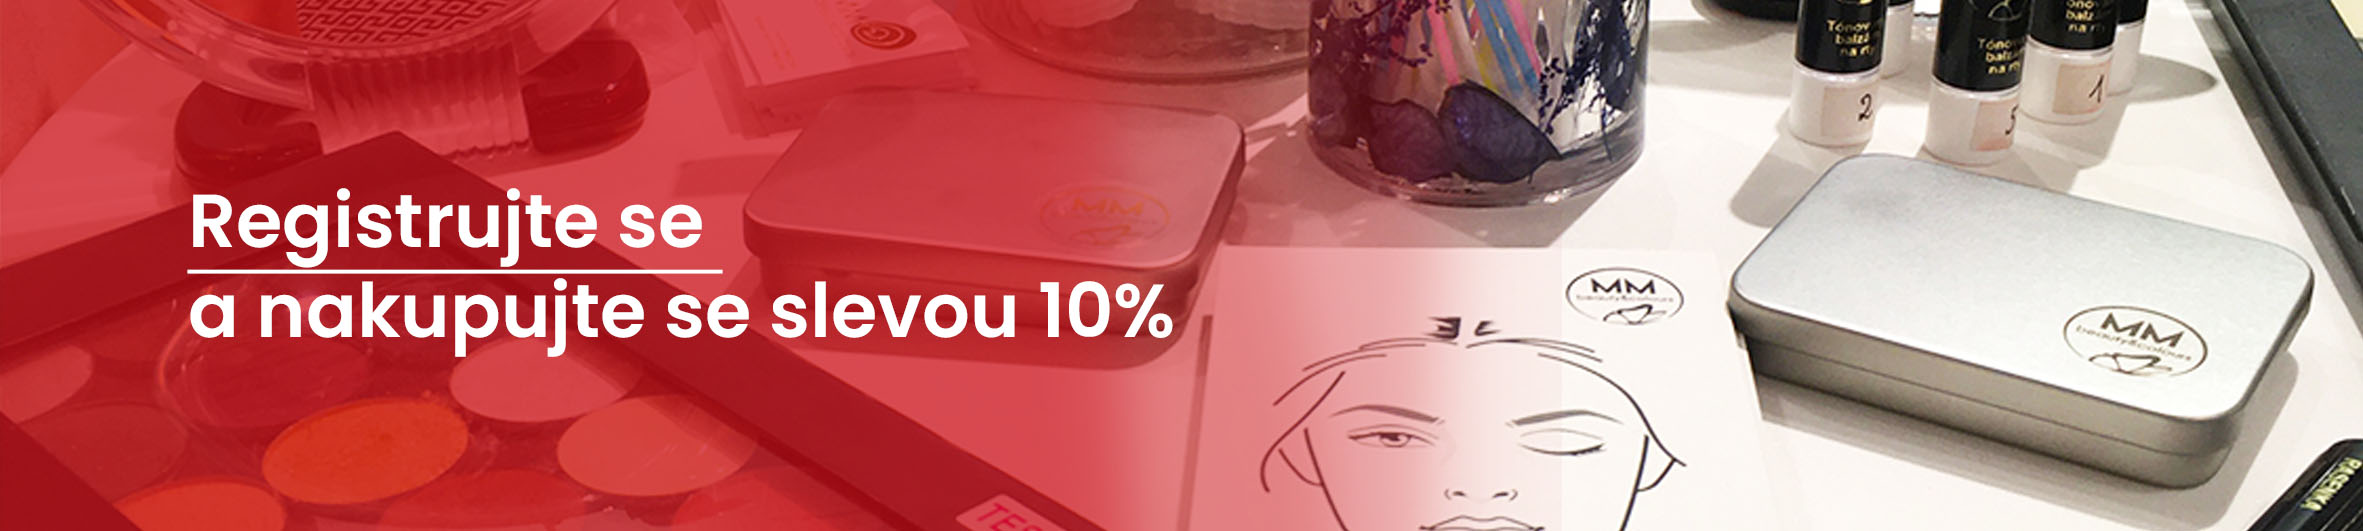 Registrace 10% sleva